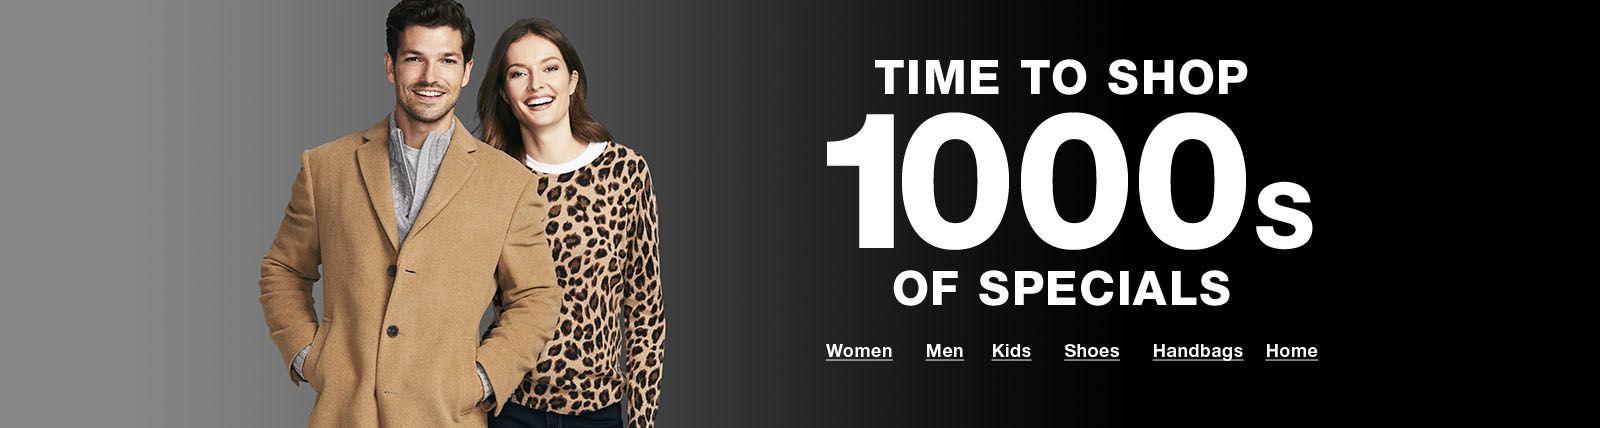 Time To Shop, 1000s Of, Specials, Women, Men, Kids, Shoes, Handbags, Home